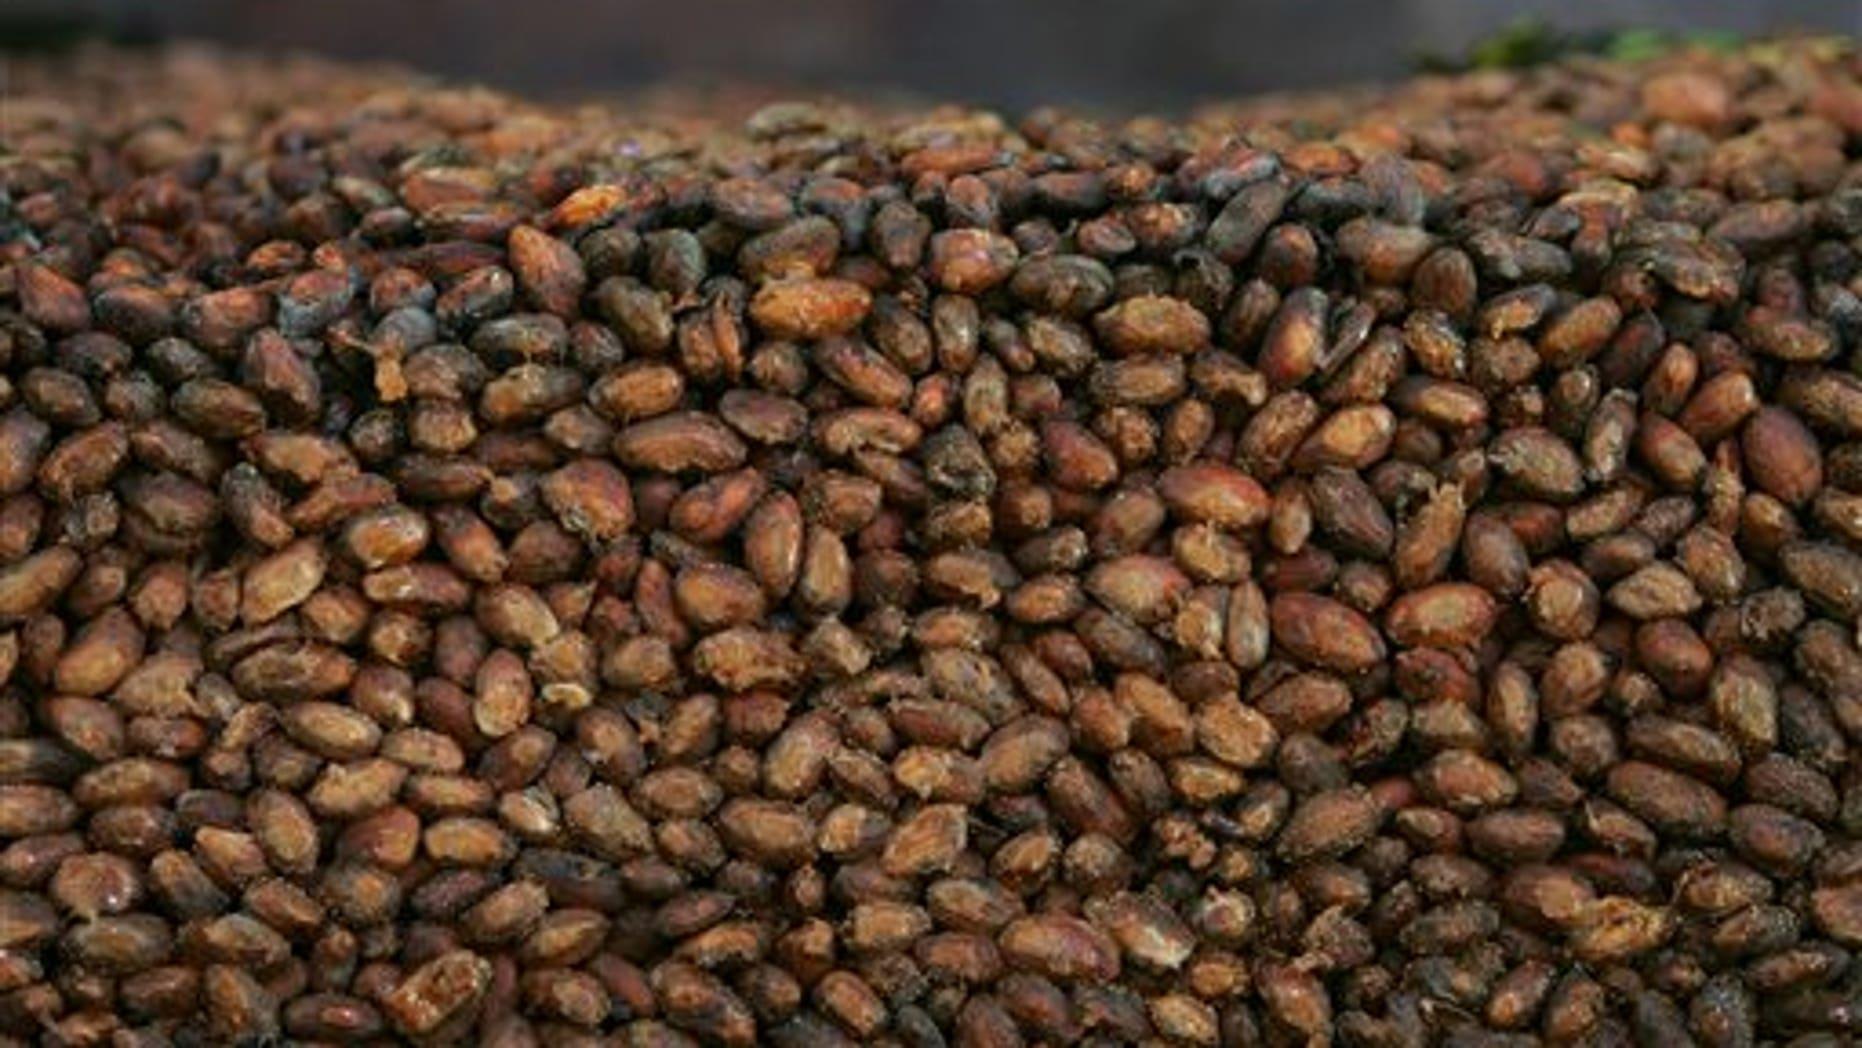 File - This Thursday, Nov. 24, 2005 file photo shows organic cocoa beans.